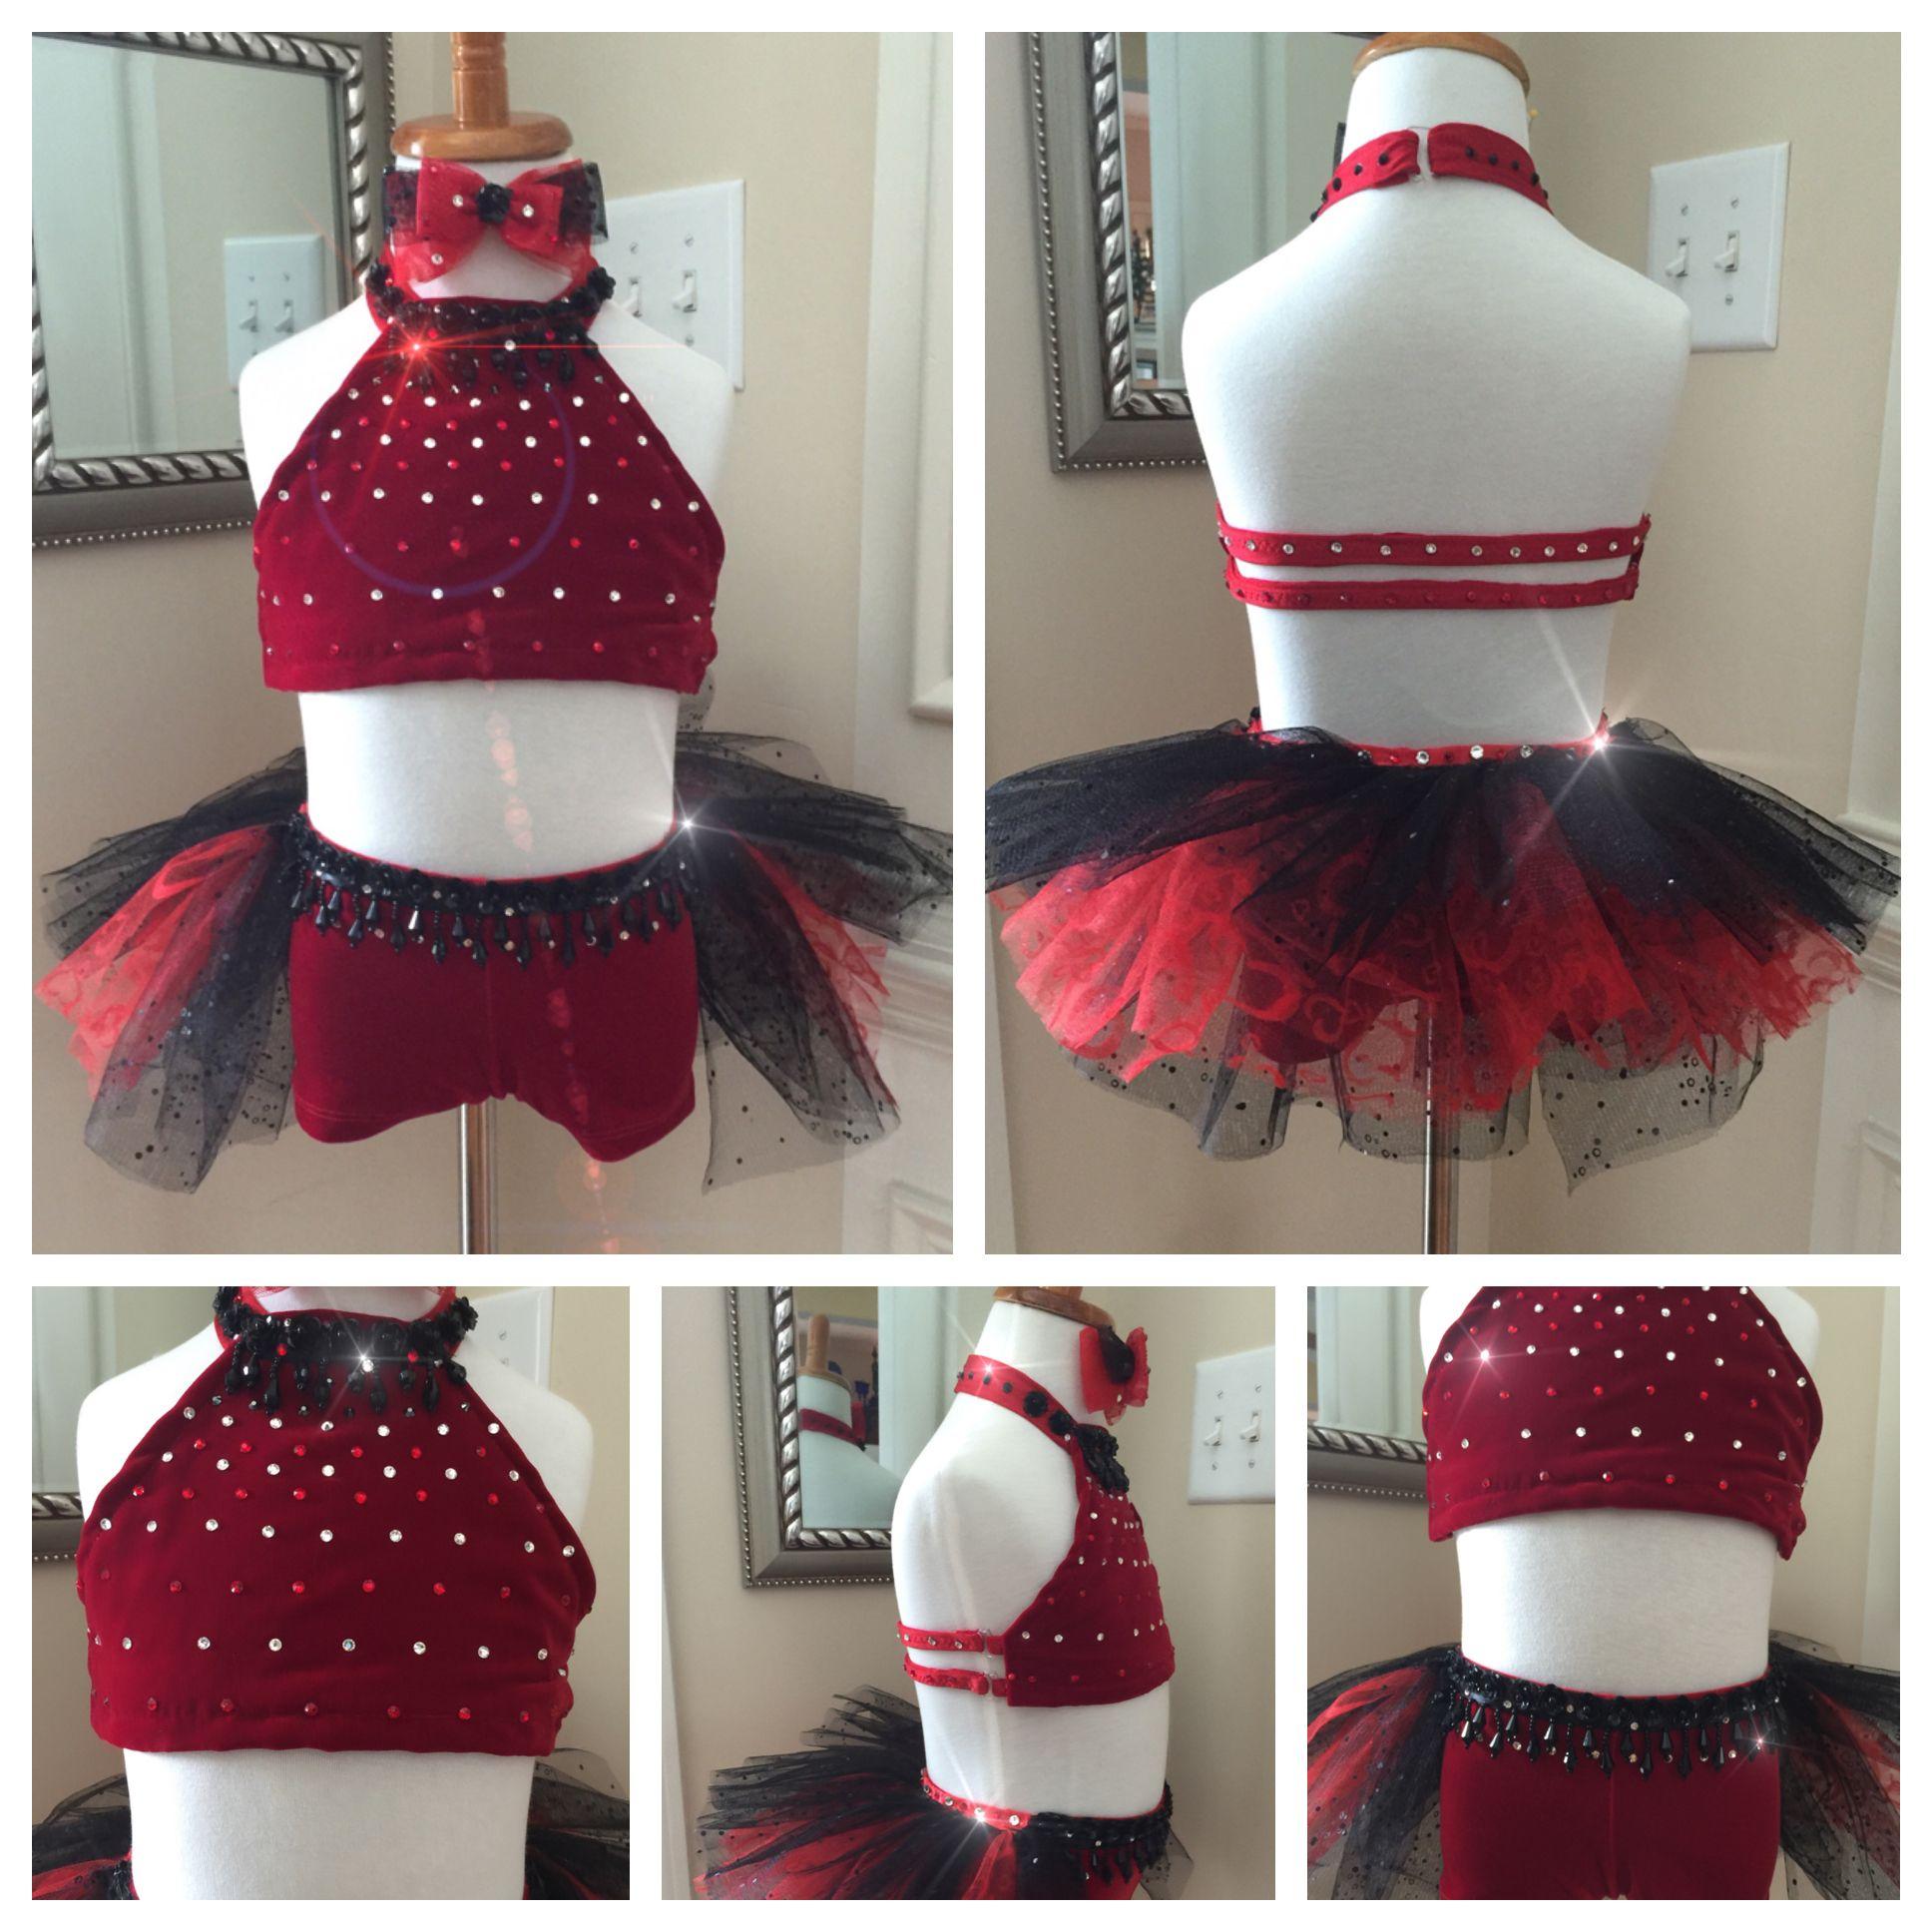 dc80016b4 2-Piece Custom Jazz Dance Costume in Red and Black | My Custom Dance ...